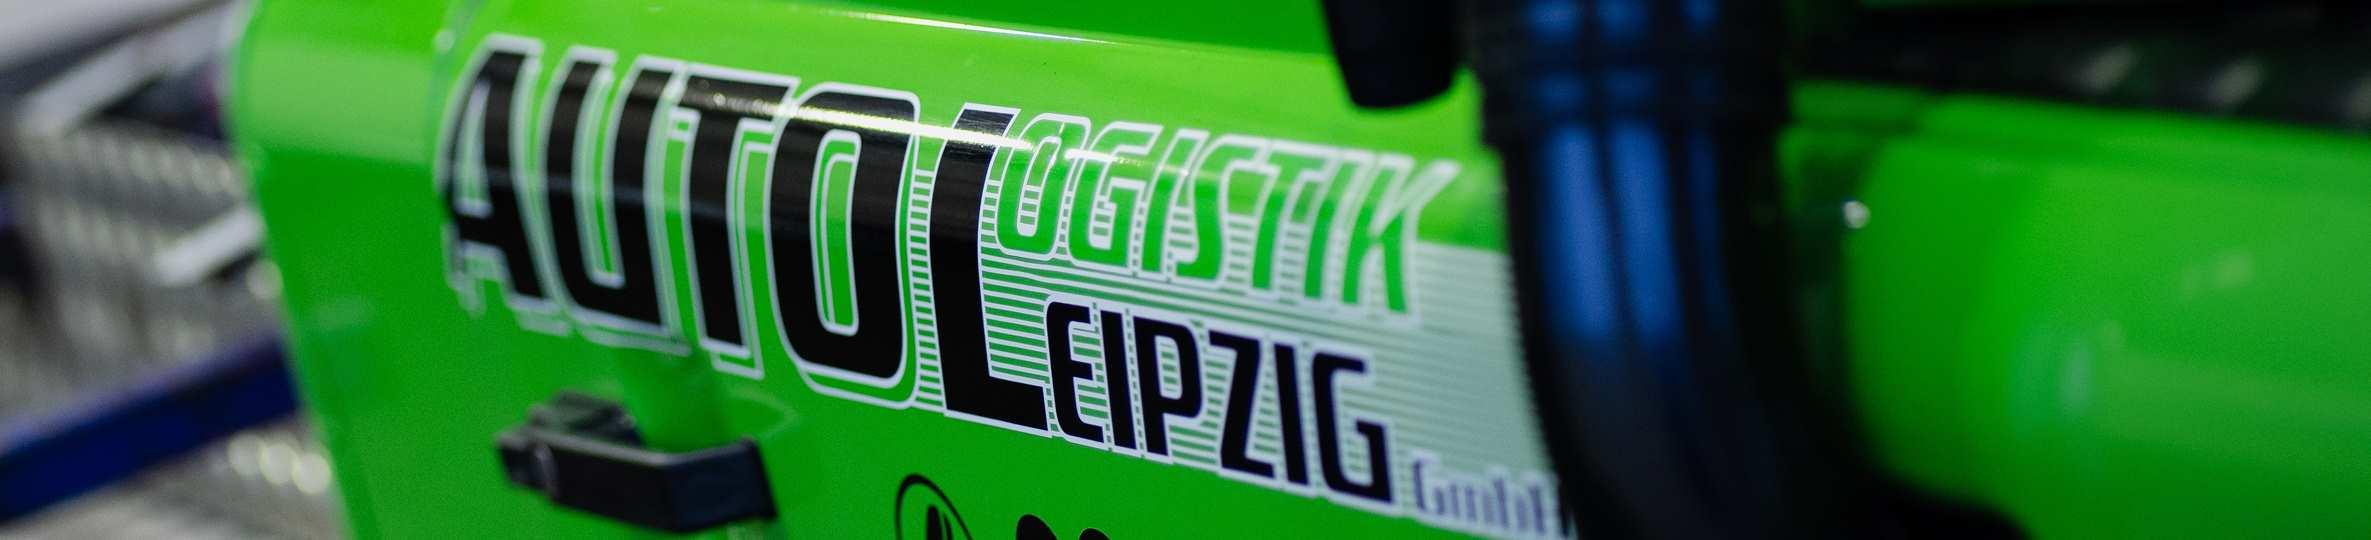 Autologistik Leipzig